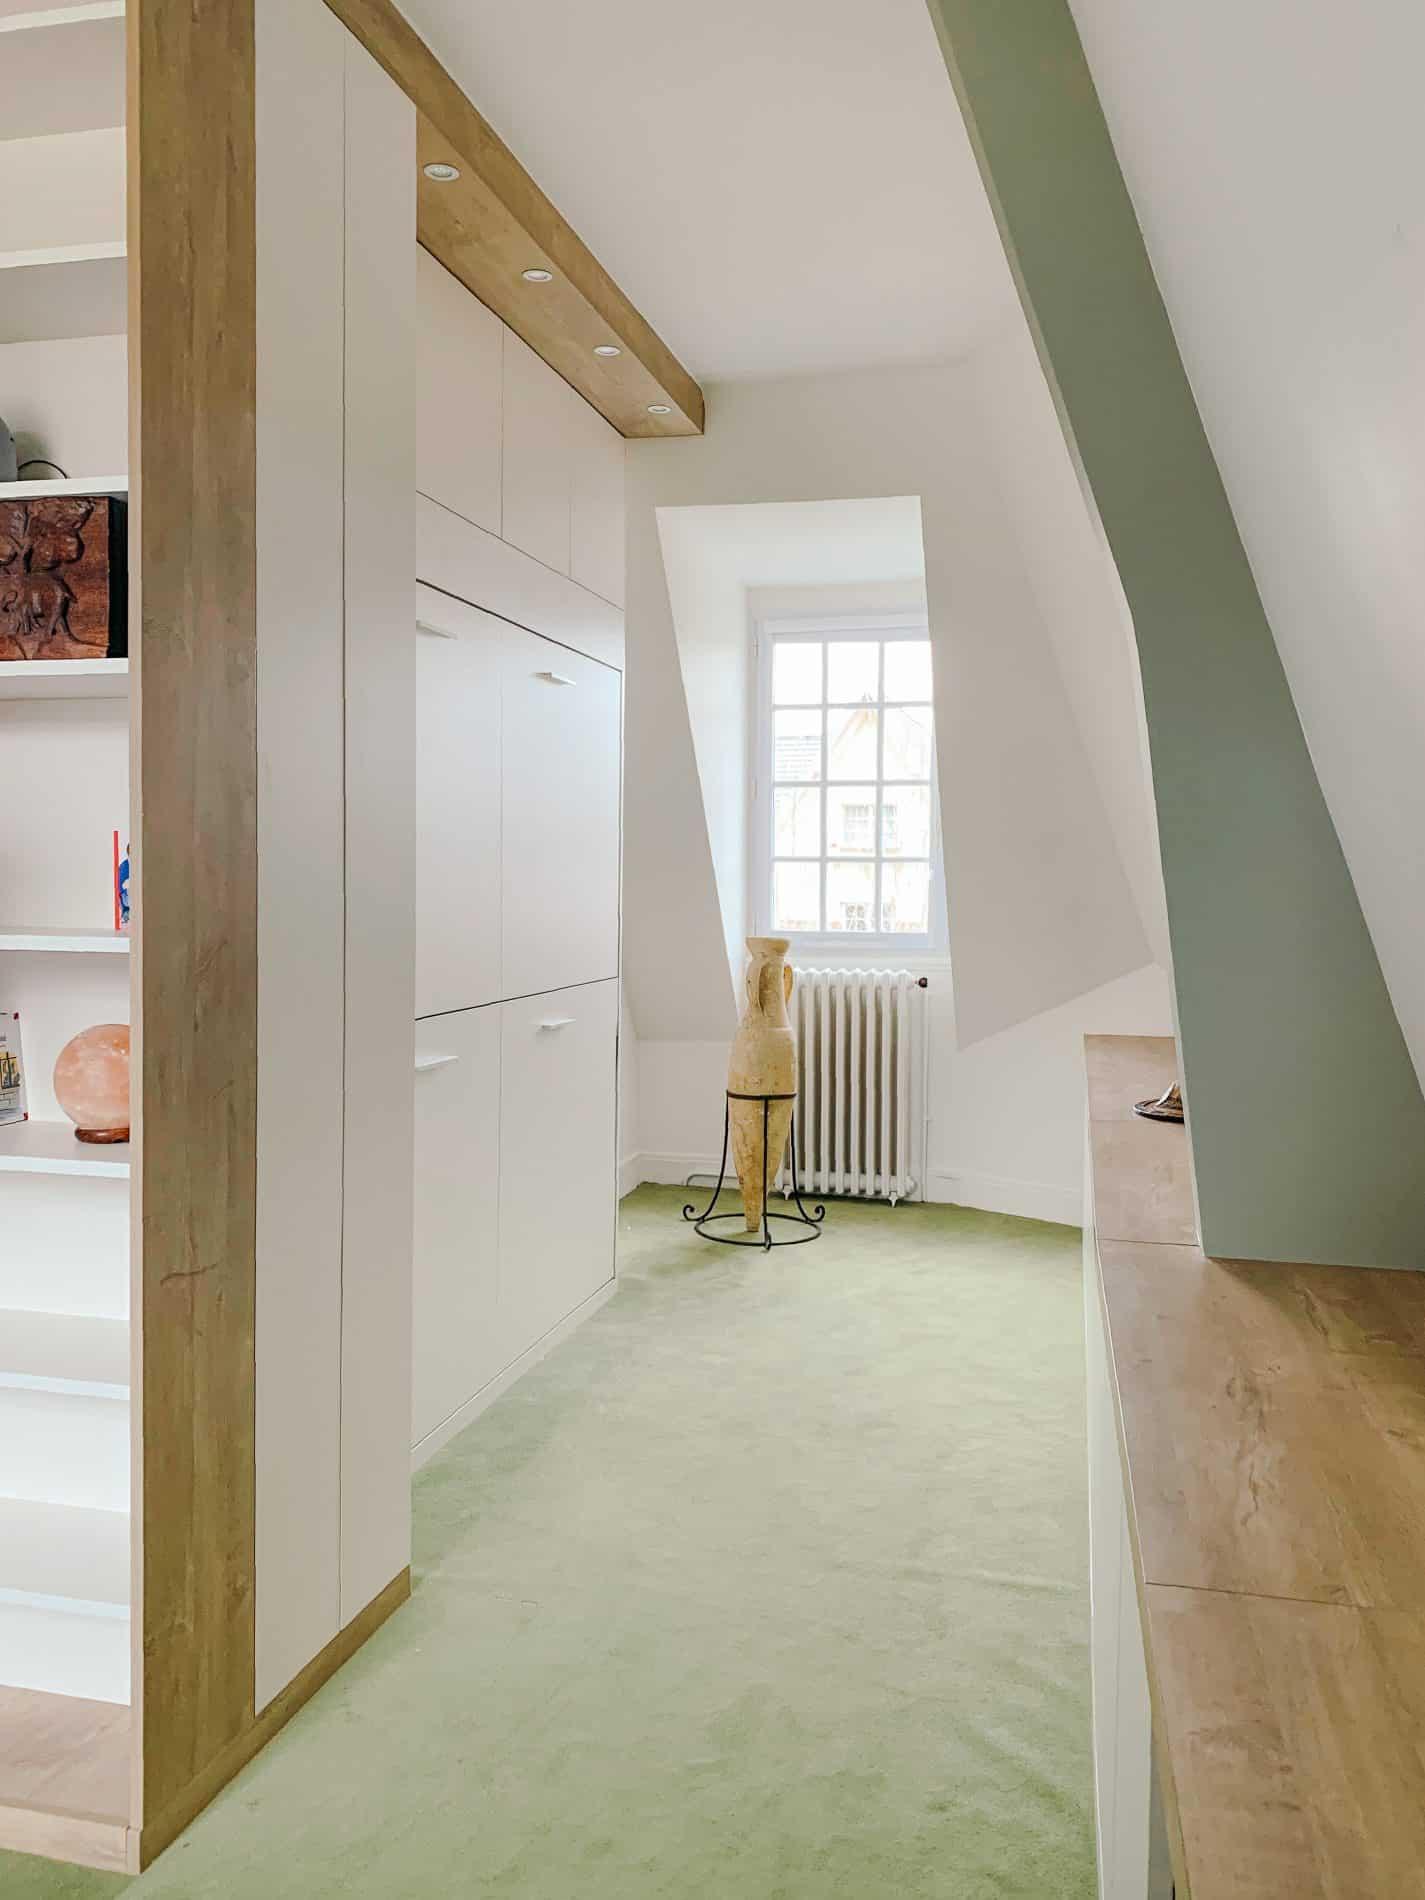 lits superposés rabattable ouvert fermé